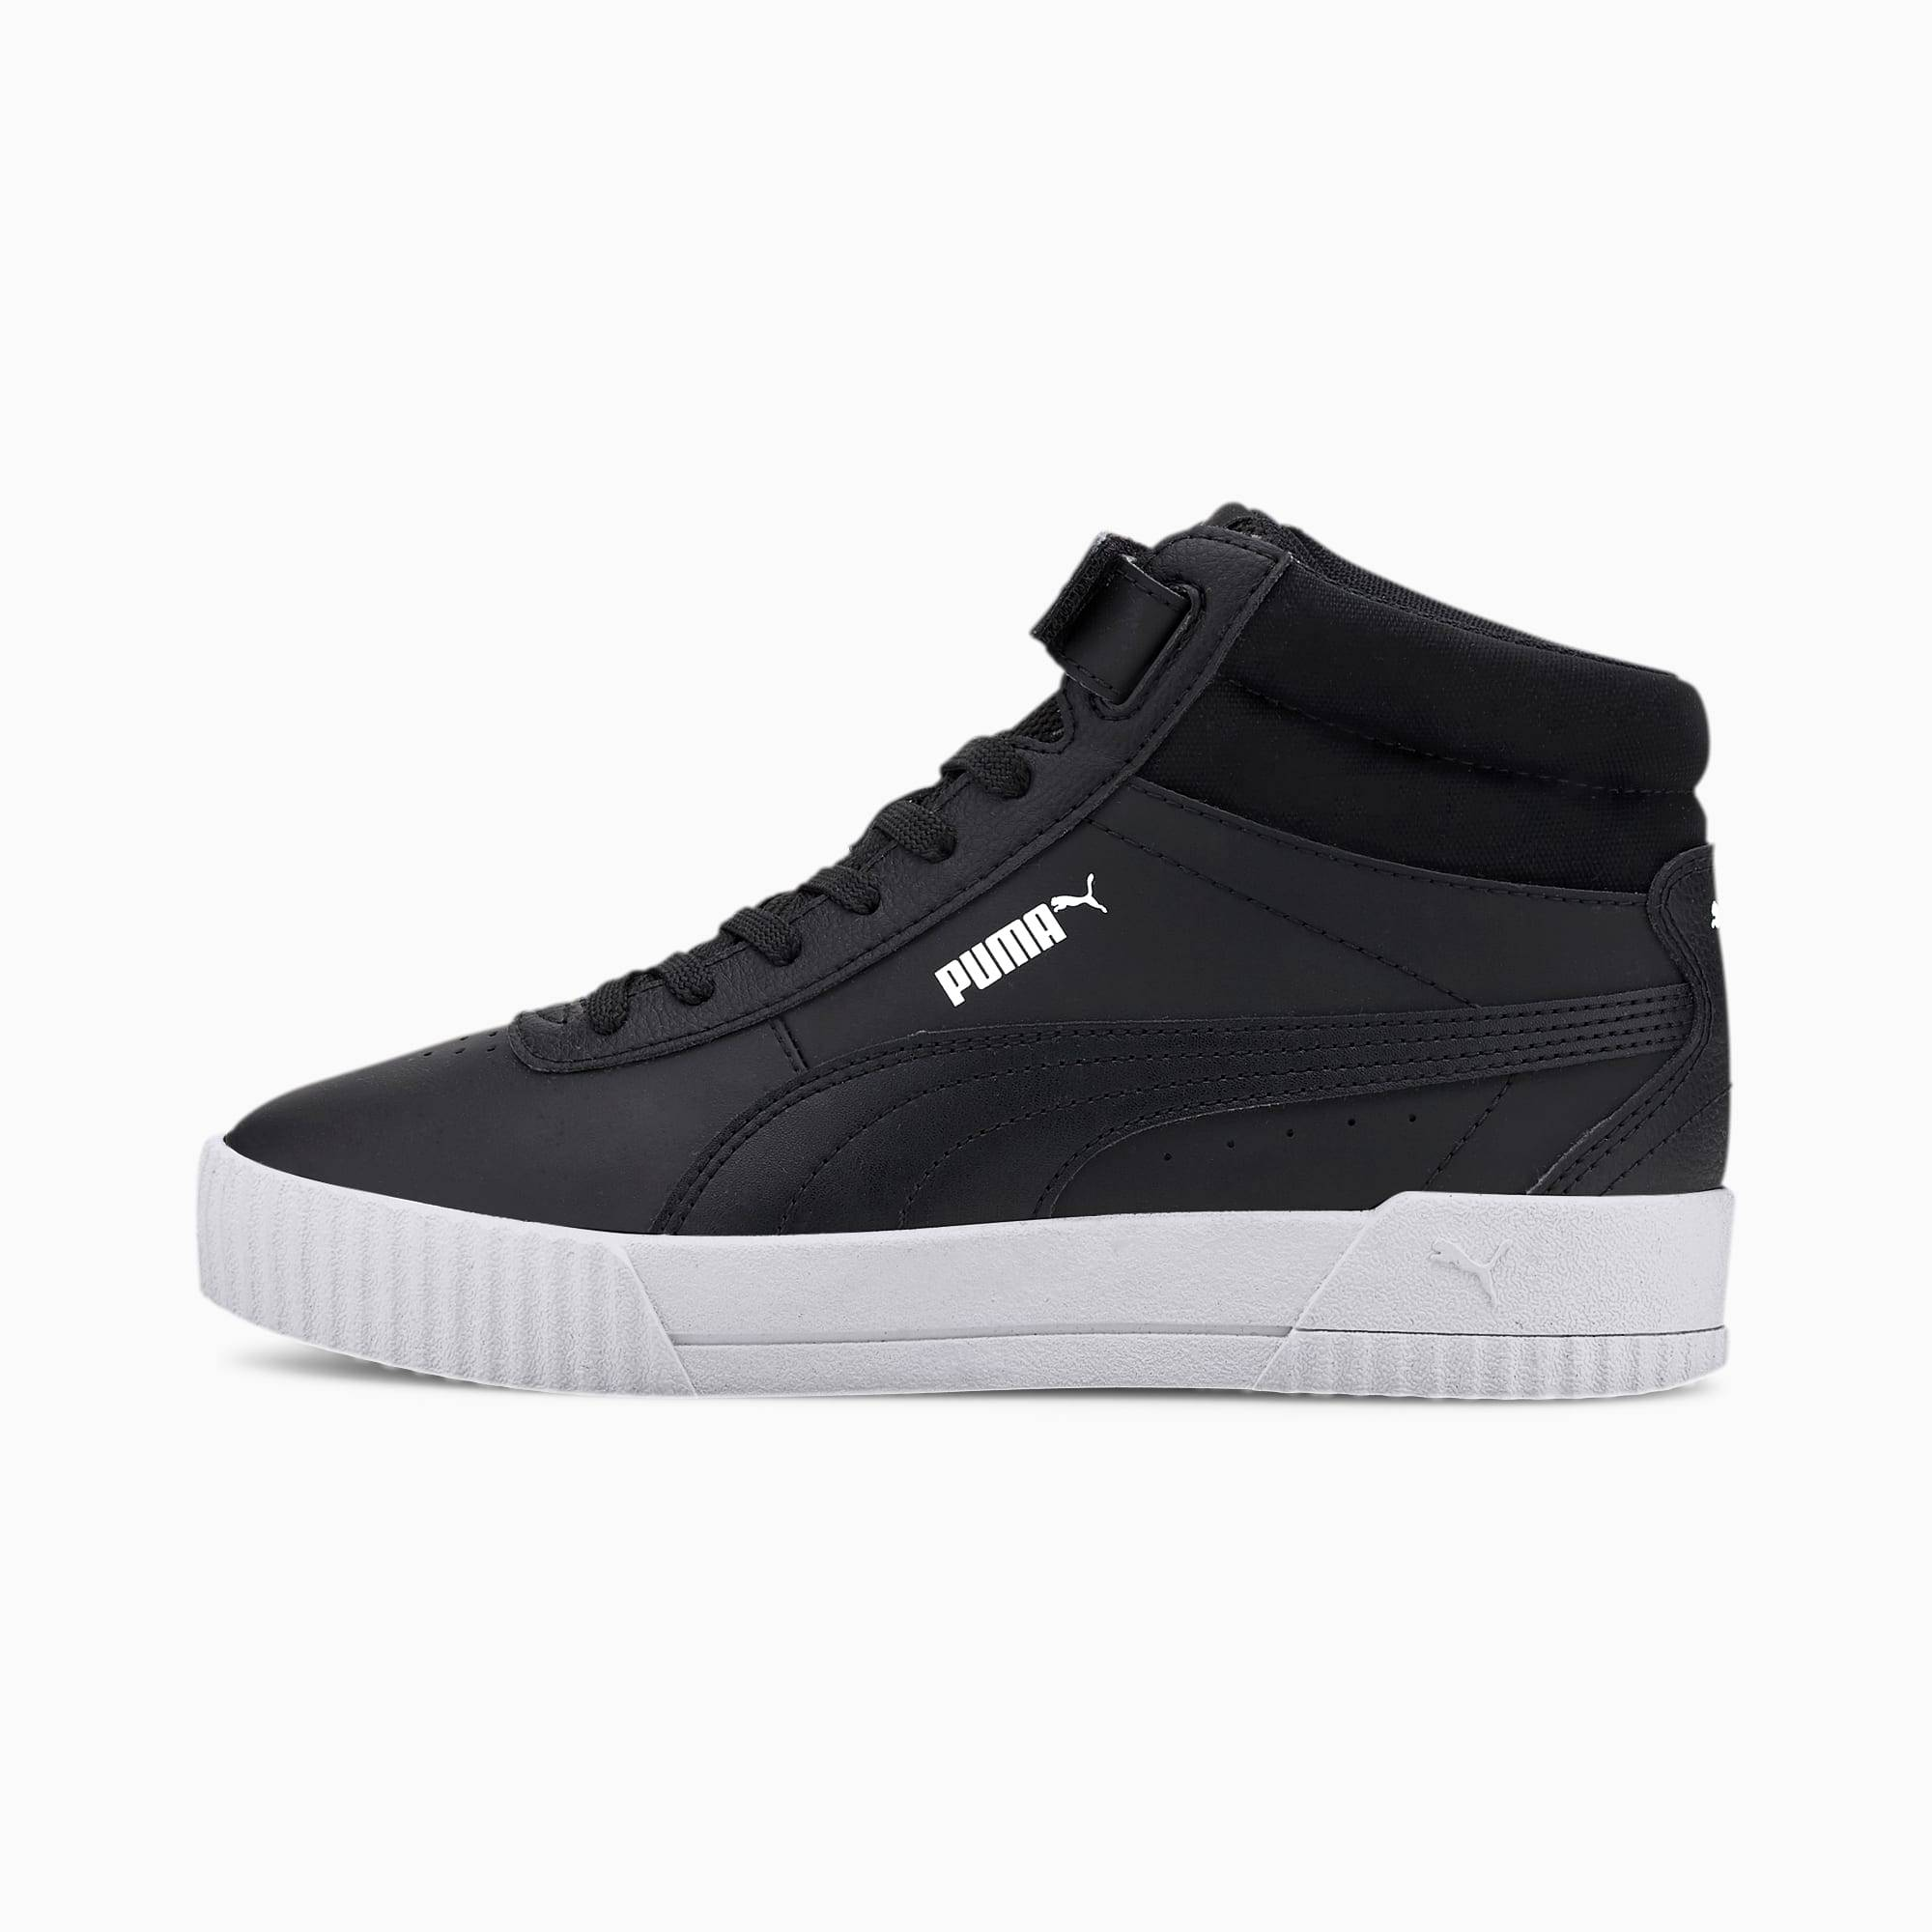 PUMA Chaussure Basket montante Carina femme, Noir, Taille 37, Chaussures